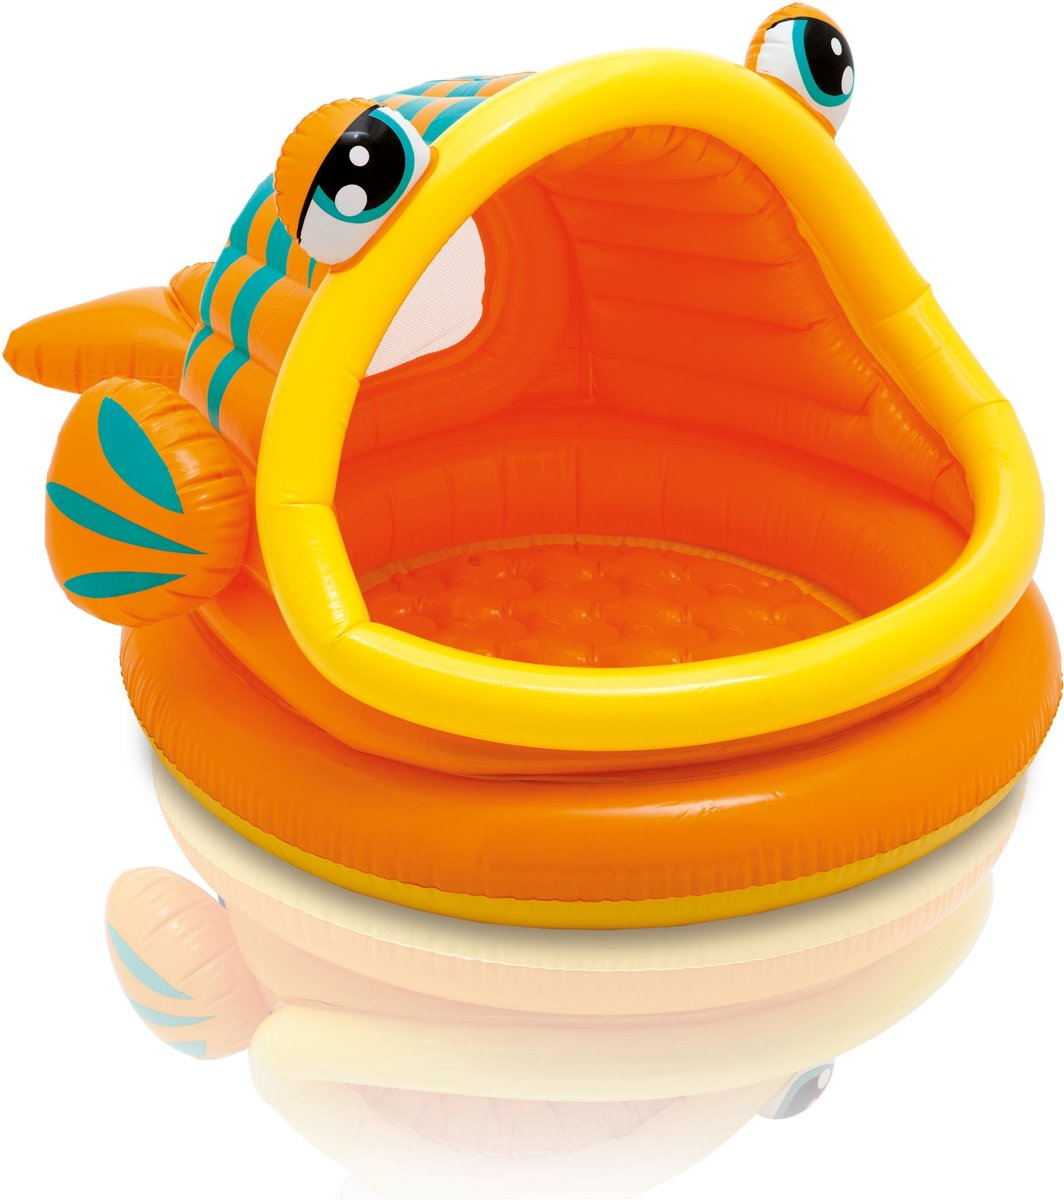 Opblaas zwembad 'Orange Fish'